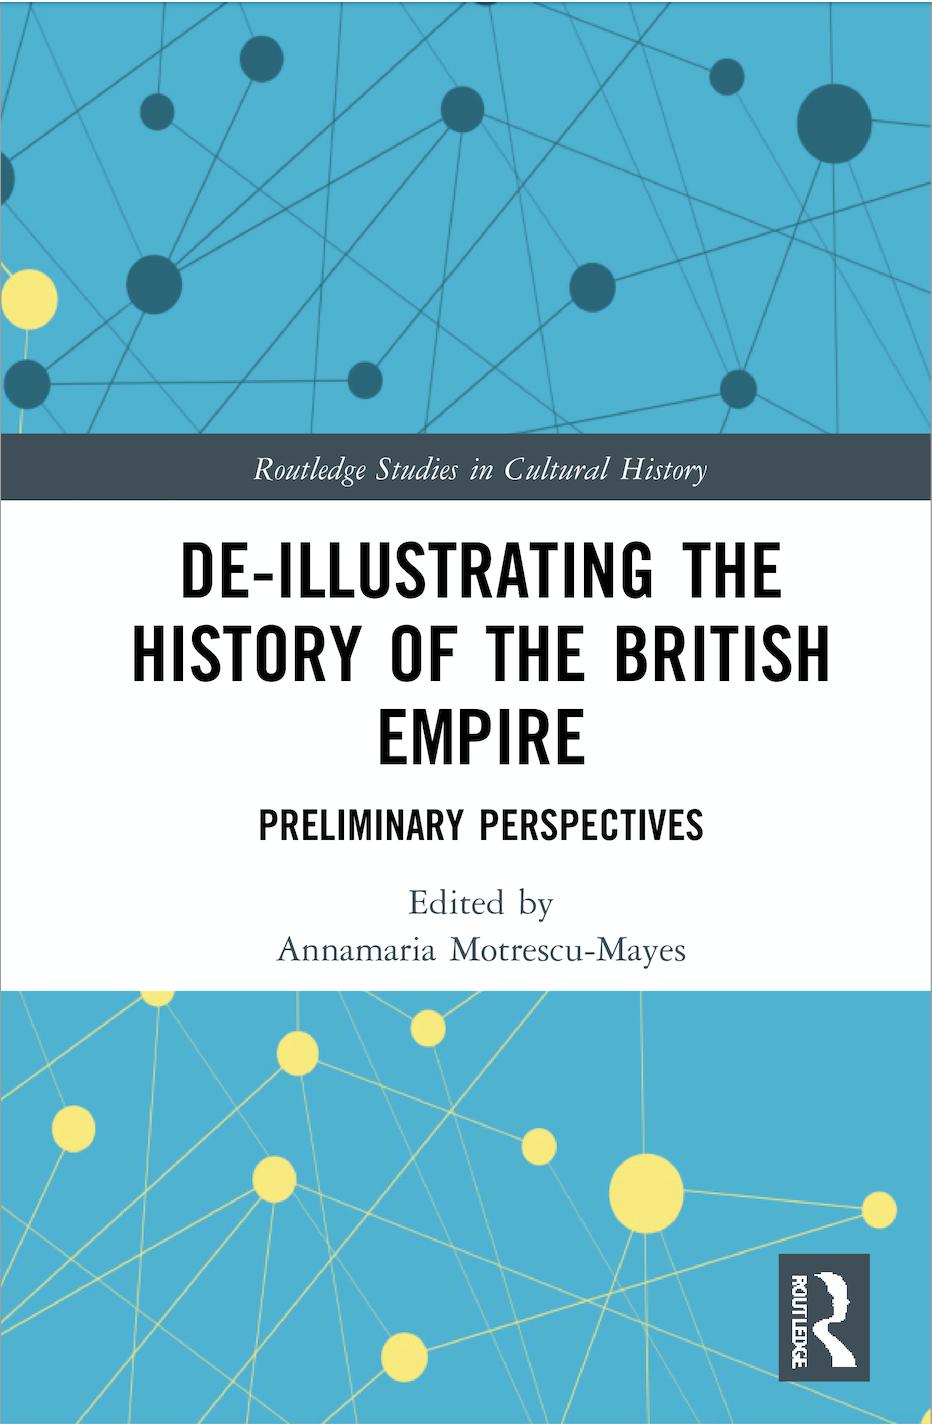 A. Motrescu-Mayes (ed.). De-Illustrating the History of the British Empire. Preliminary Perspectives